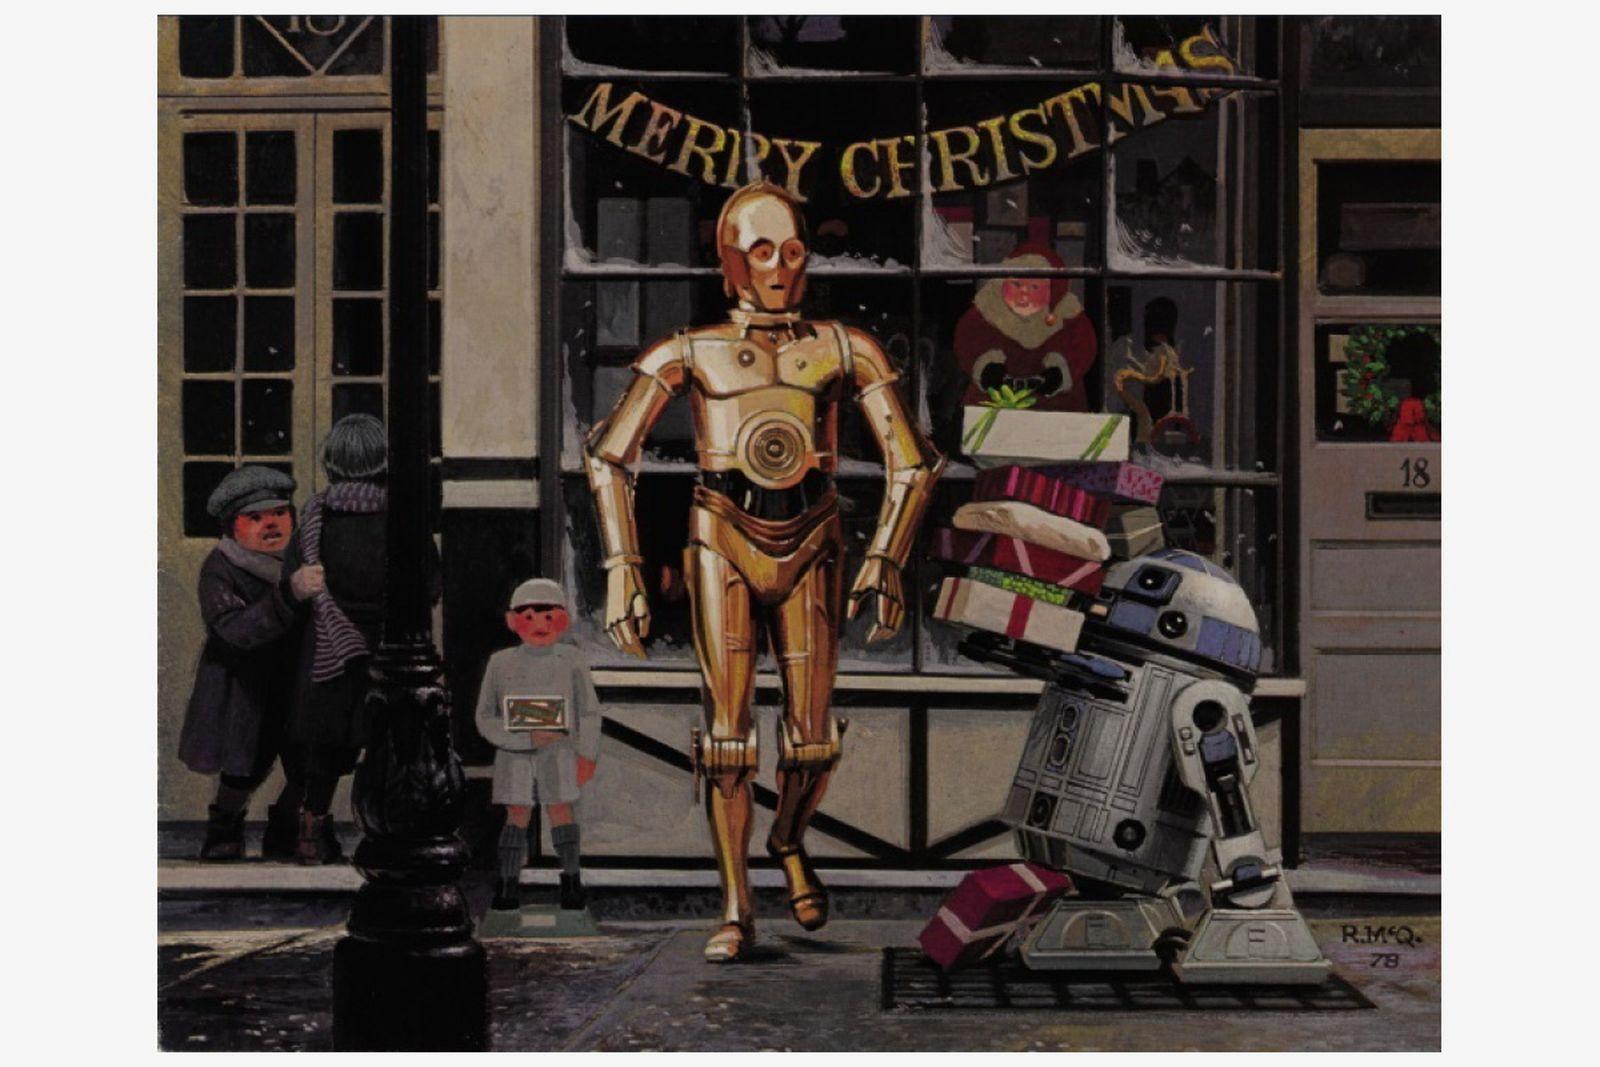 The Empire Strikes Back', EMI Elstree Studios Christmas card and envelope, 1980